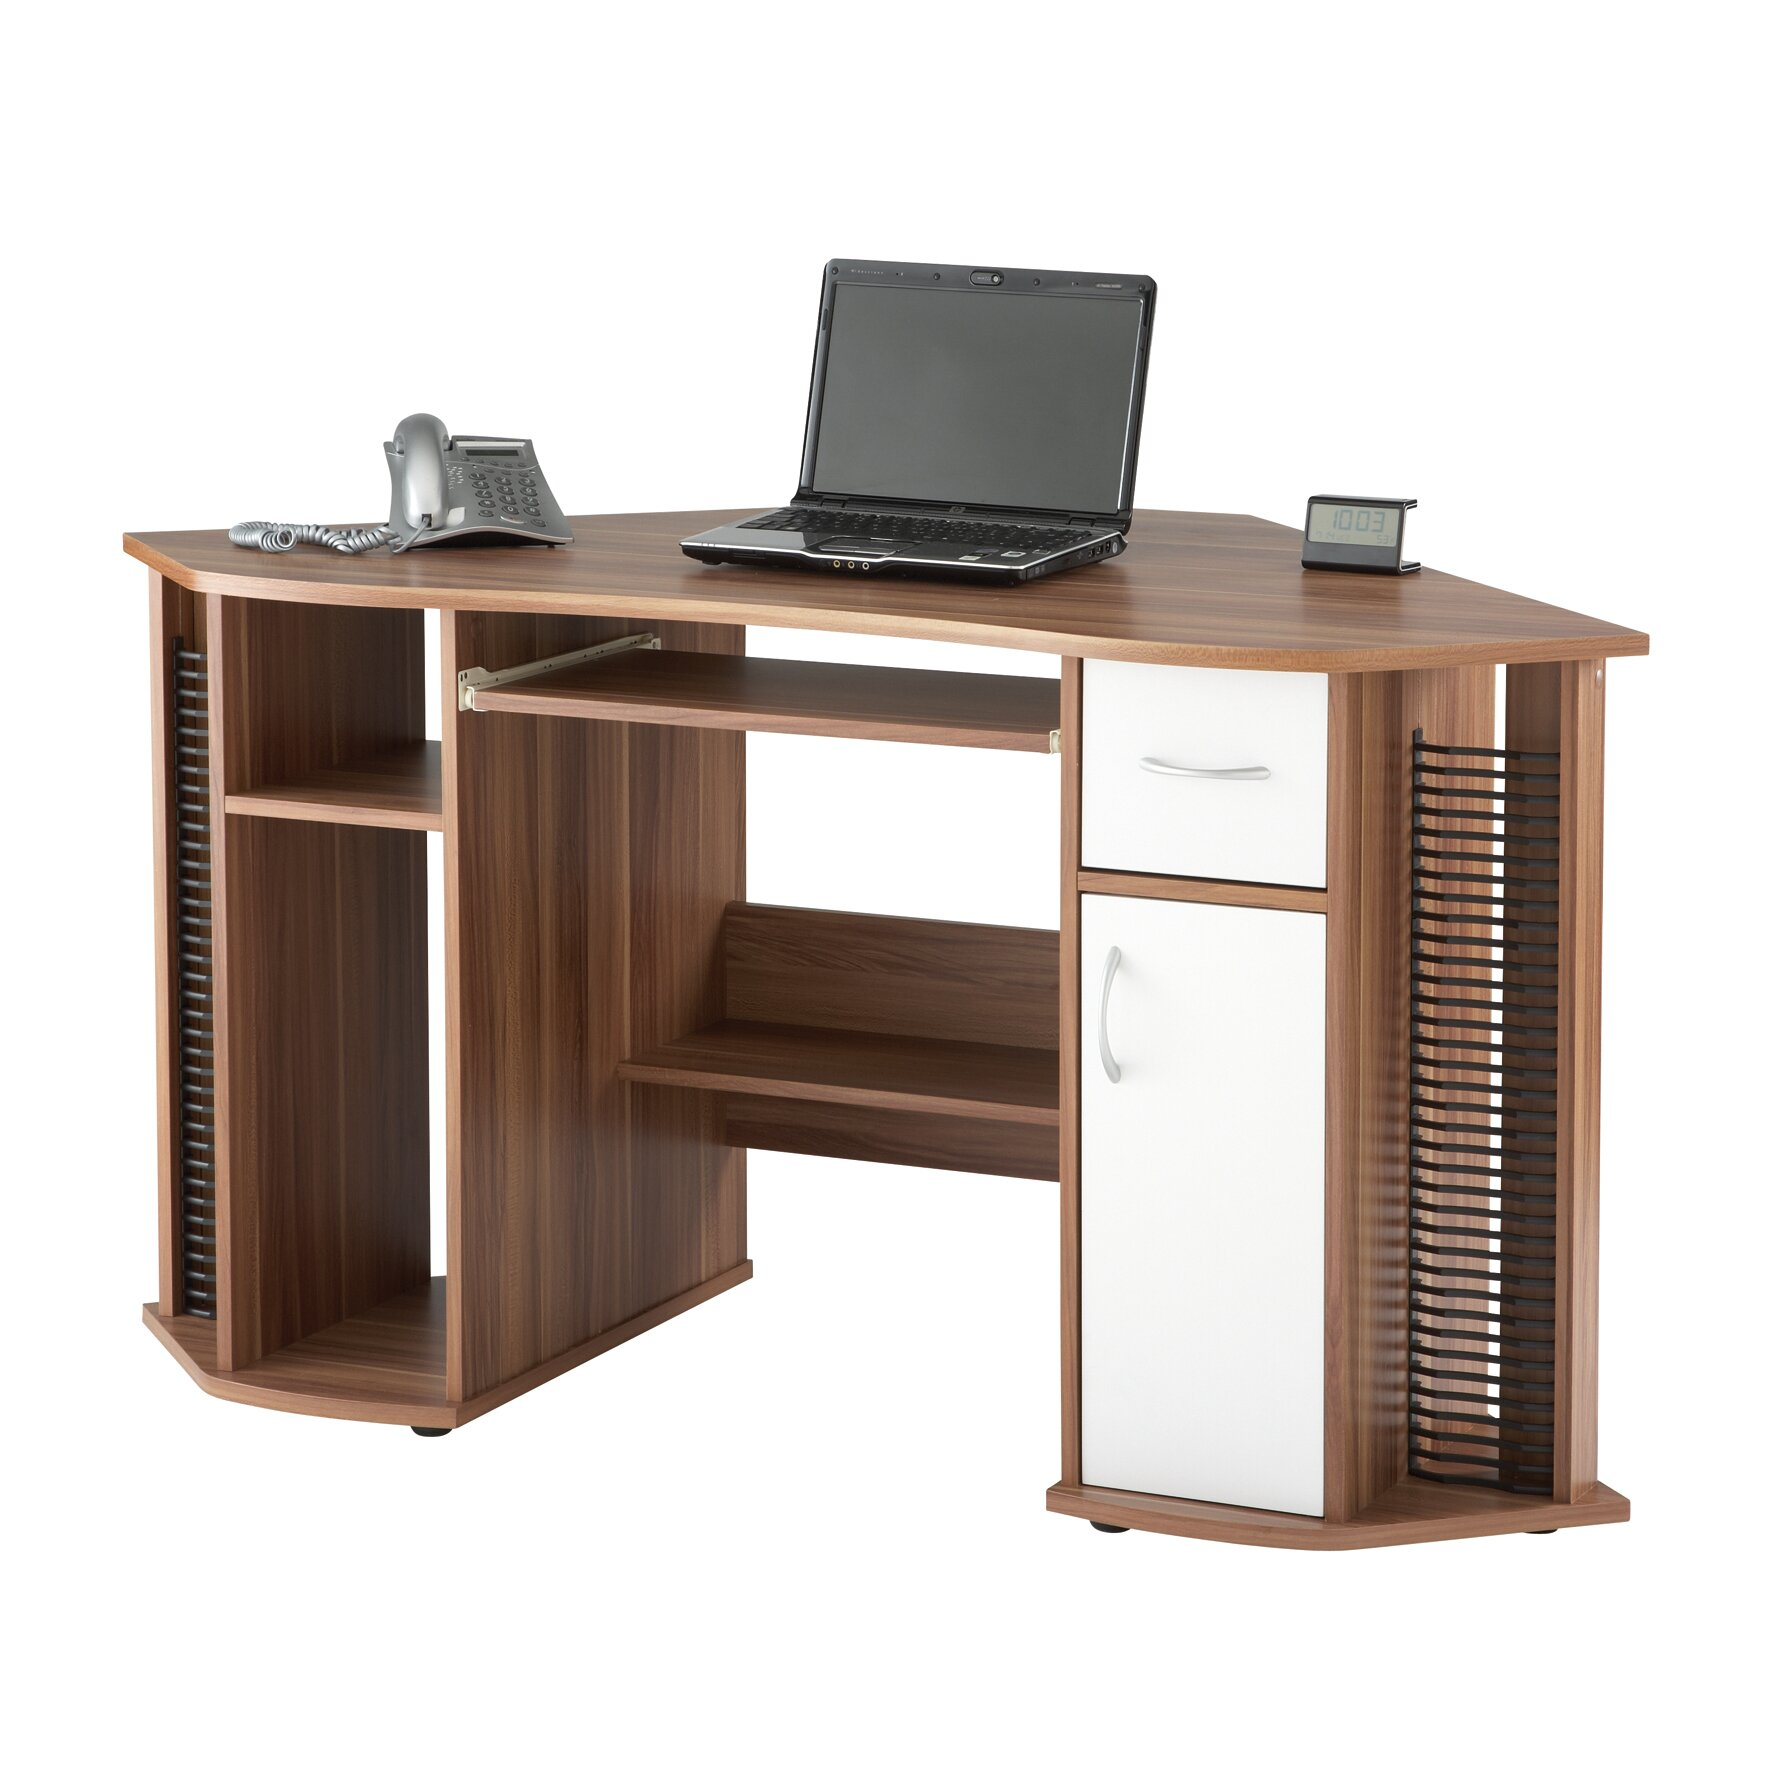 Home Etc Maxam Computer Desk With Keyboard Tray Wayfair Uk